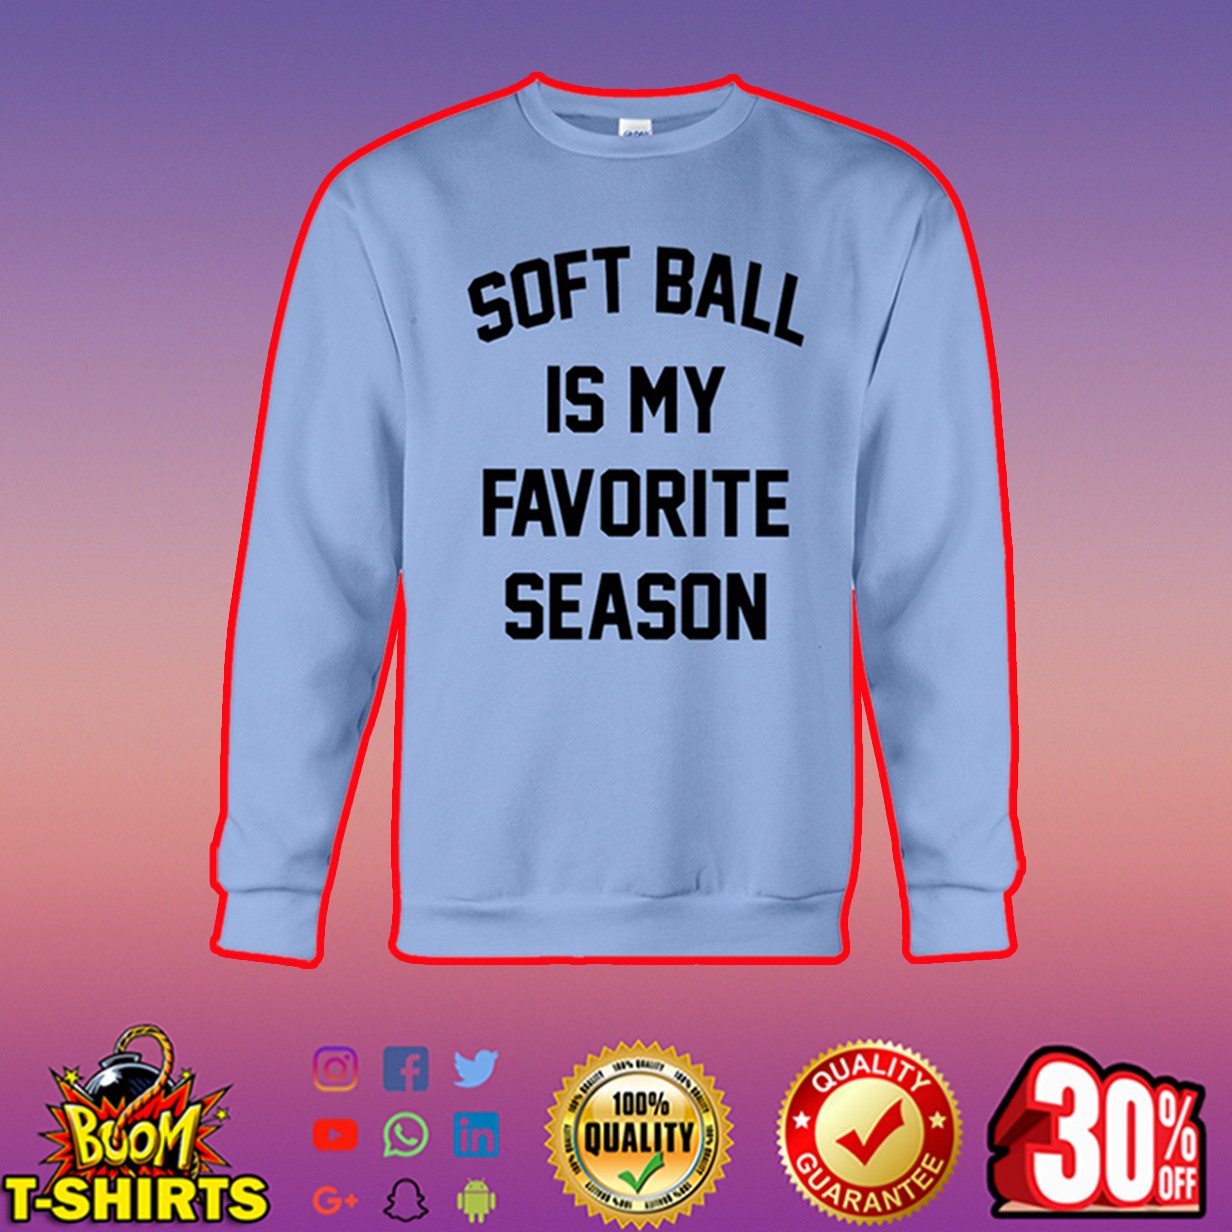 Soft Ball is my Favorite Season sweatshirt